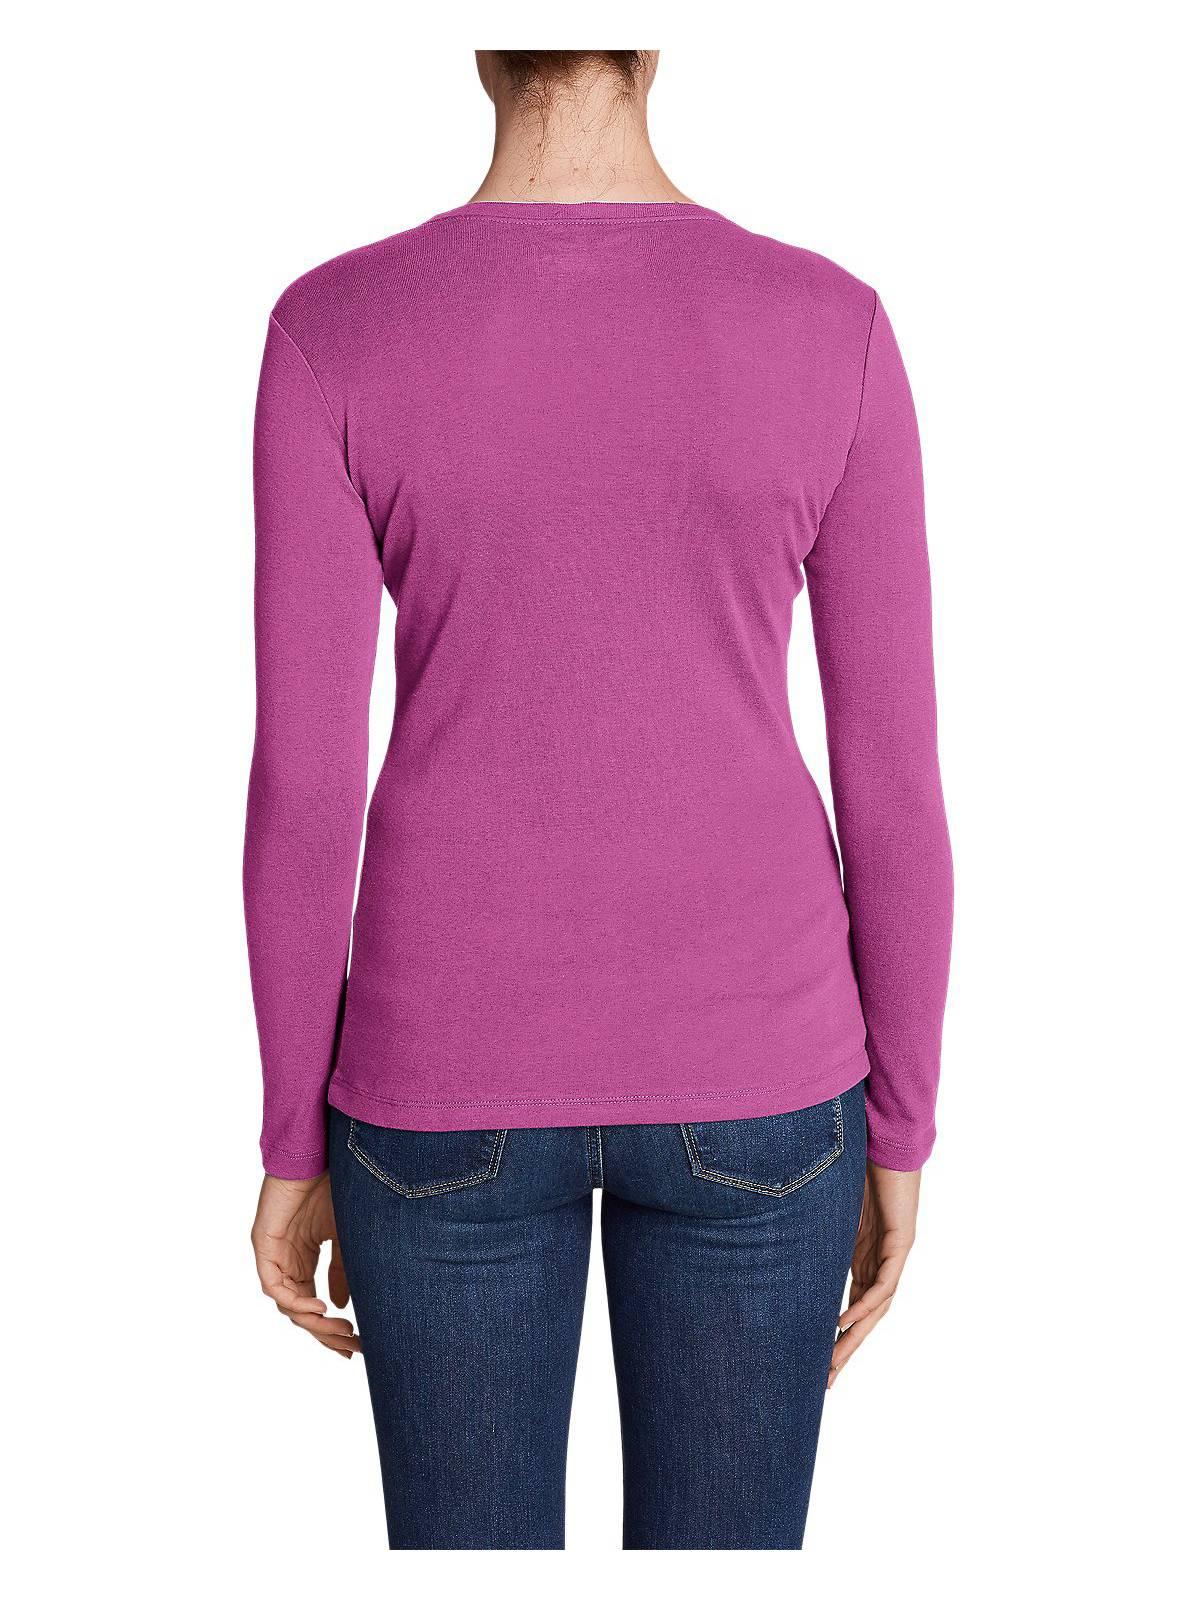 Eddie-Bauer-Women-039-s-Favorite-Long-Sleeve-V-Neck-T-Shirt thumbnail 23